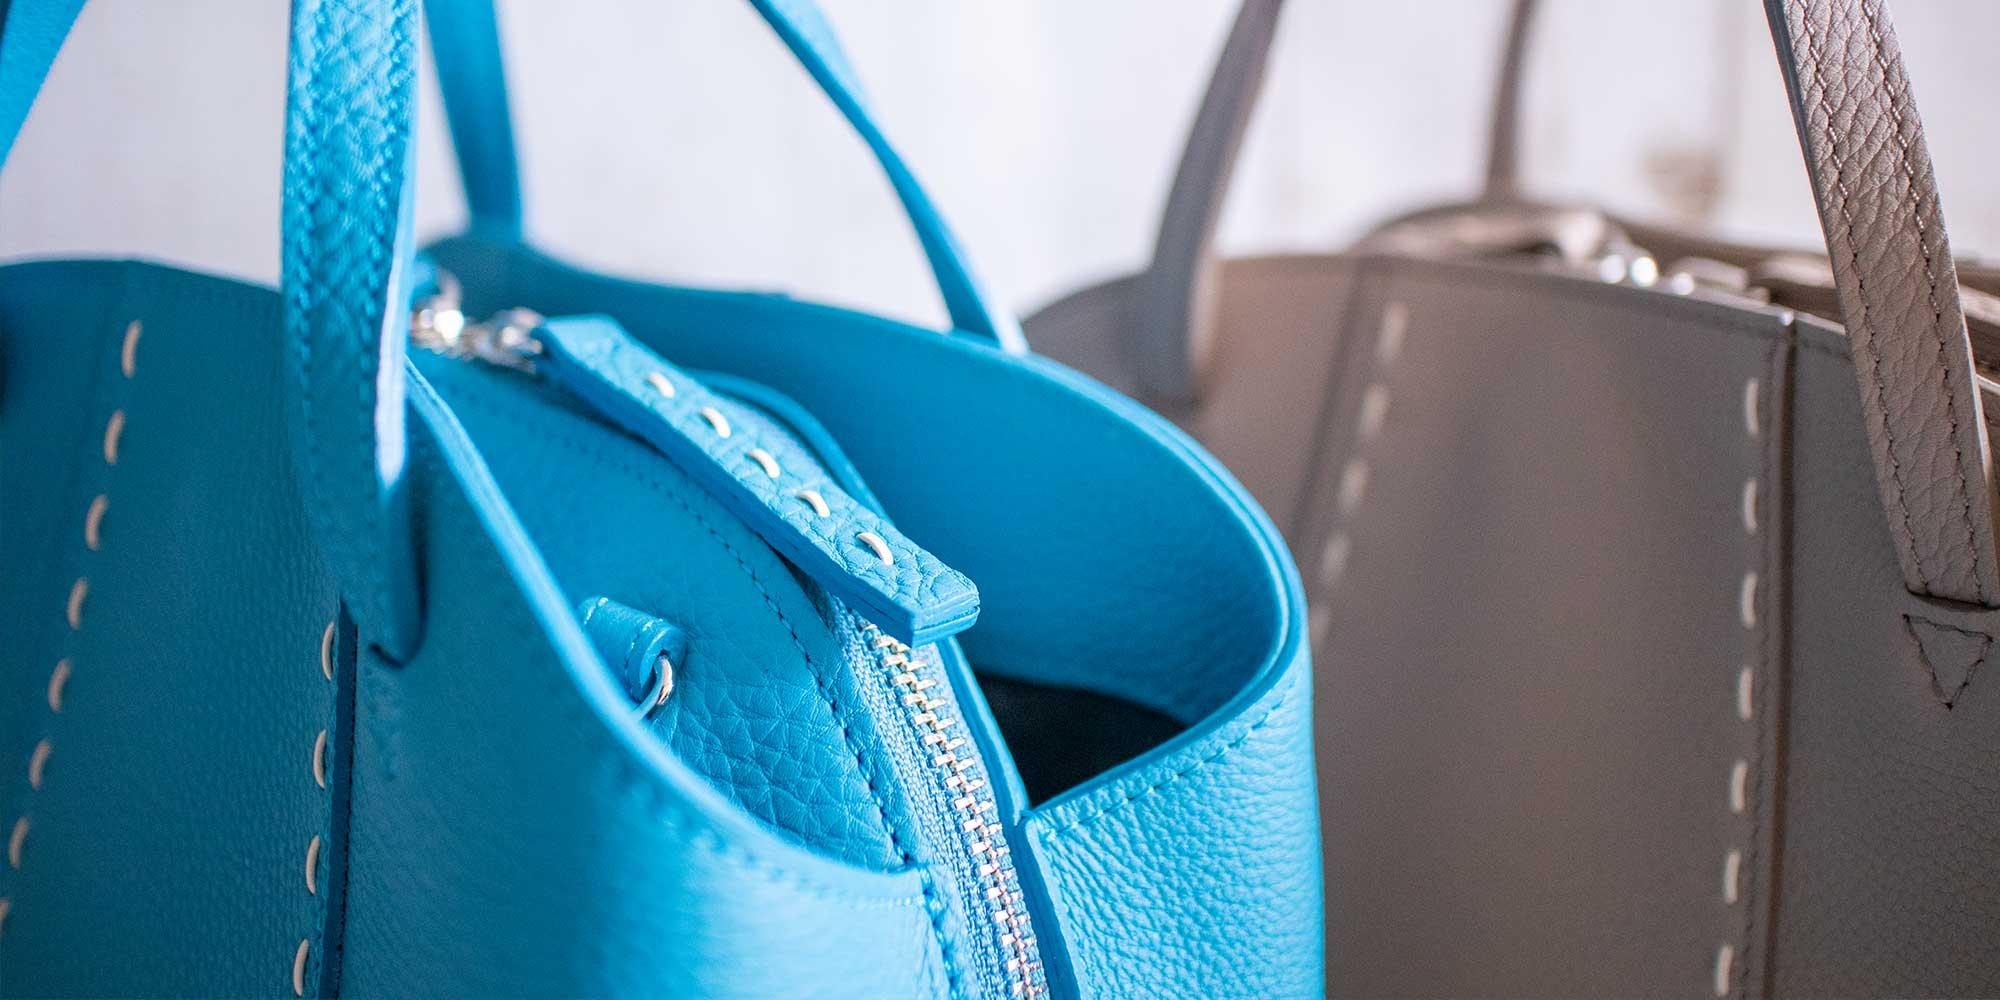 28f62dd03279 本革で造るバッグと財布『NAGATANI』 公式オンラインショップ   日本発祥のブランド 本革バッグと財布の製造と販売